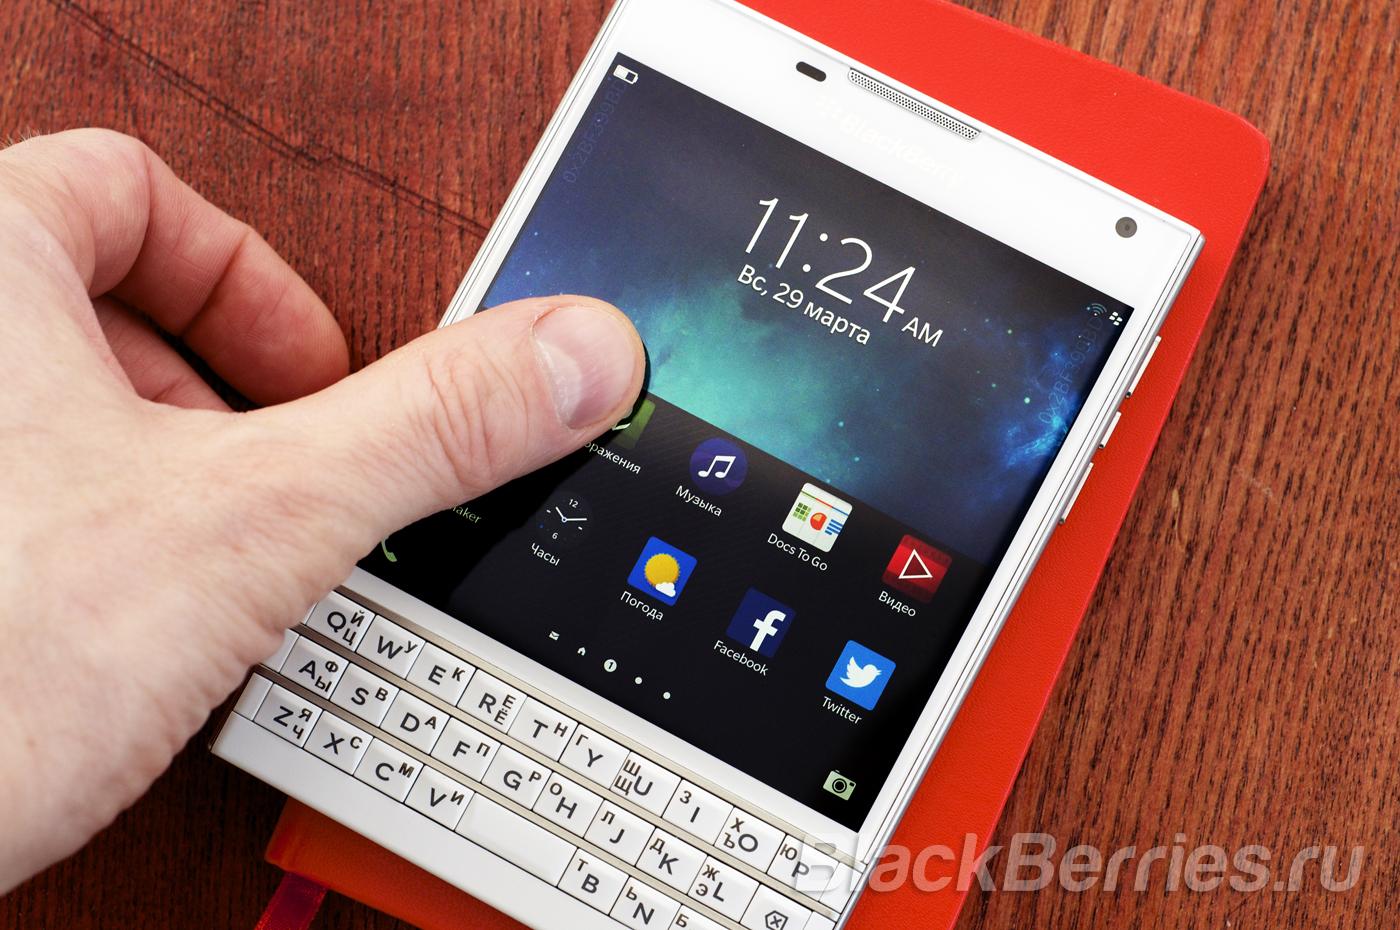 BlackBerry-Passport-10-3-2-1